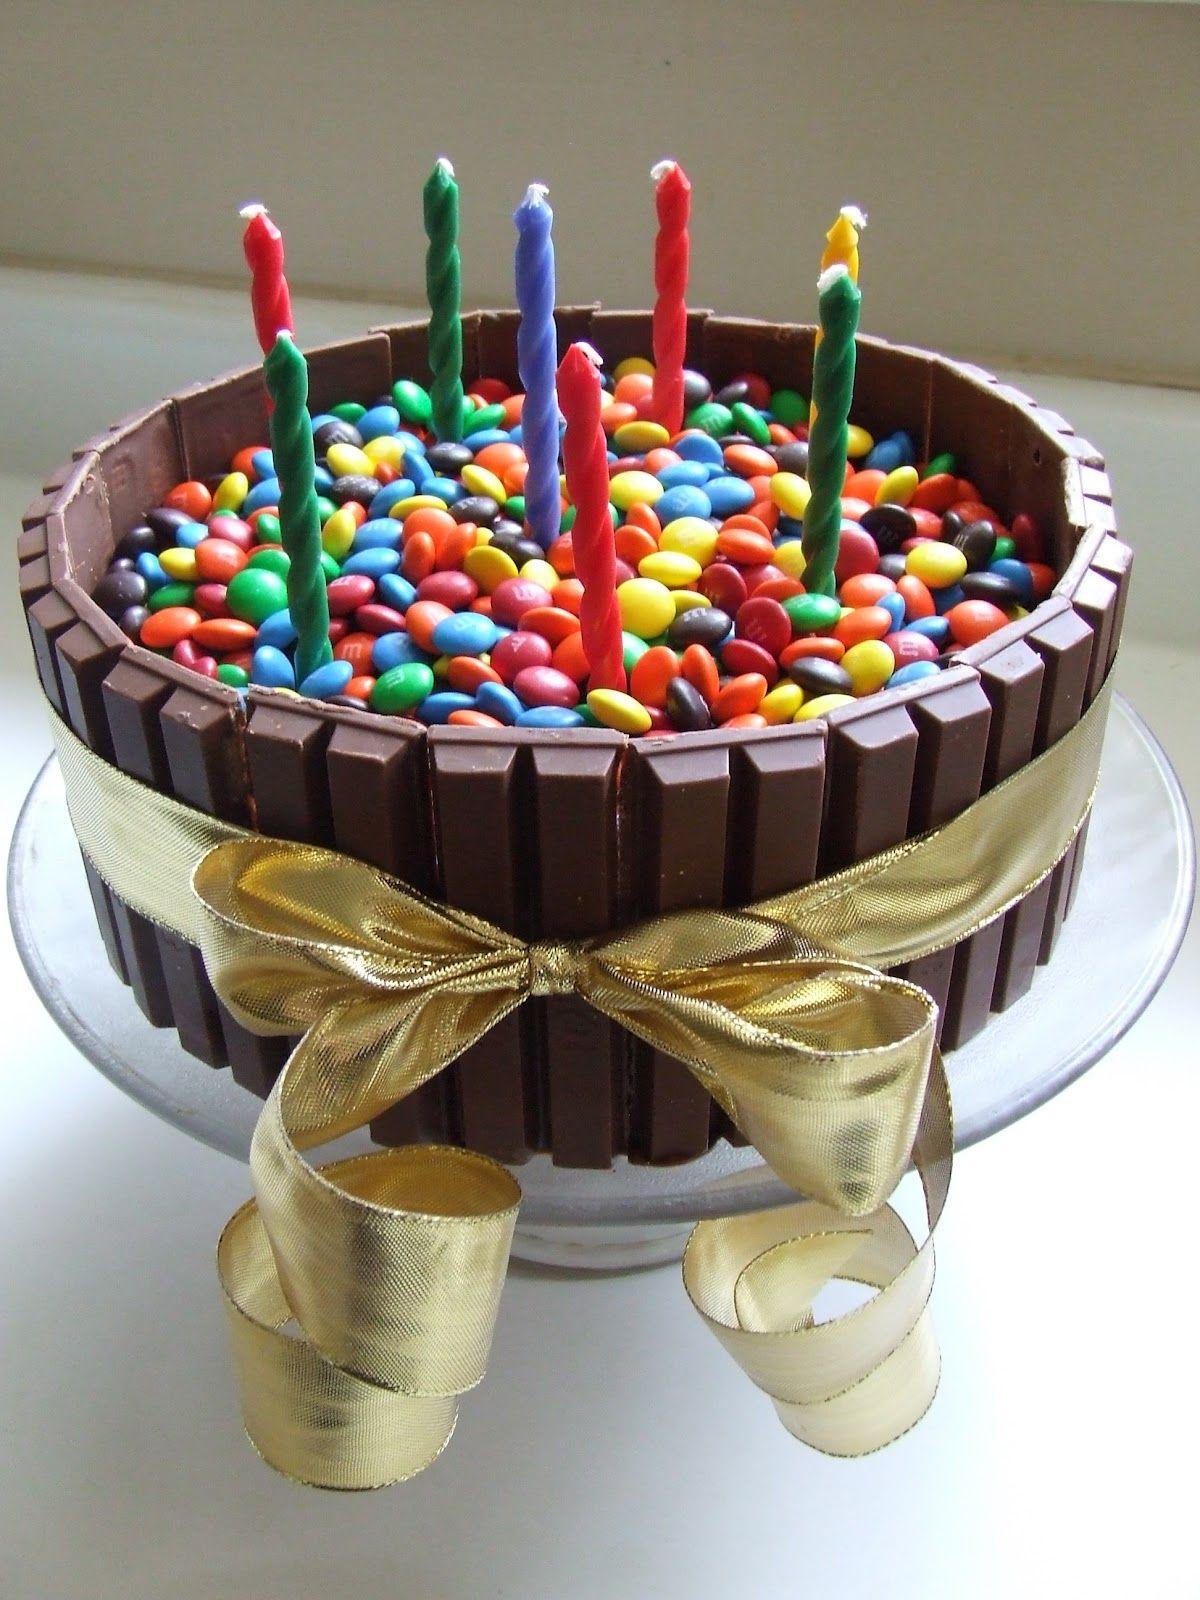 Dscf5625 Jpg 1 200 1 600 Pixels Birthday Cakes For Teens Birthday Cupcakes Boy Cool Birthday Cakes